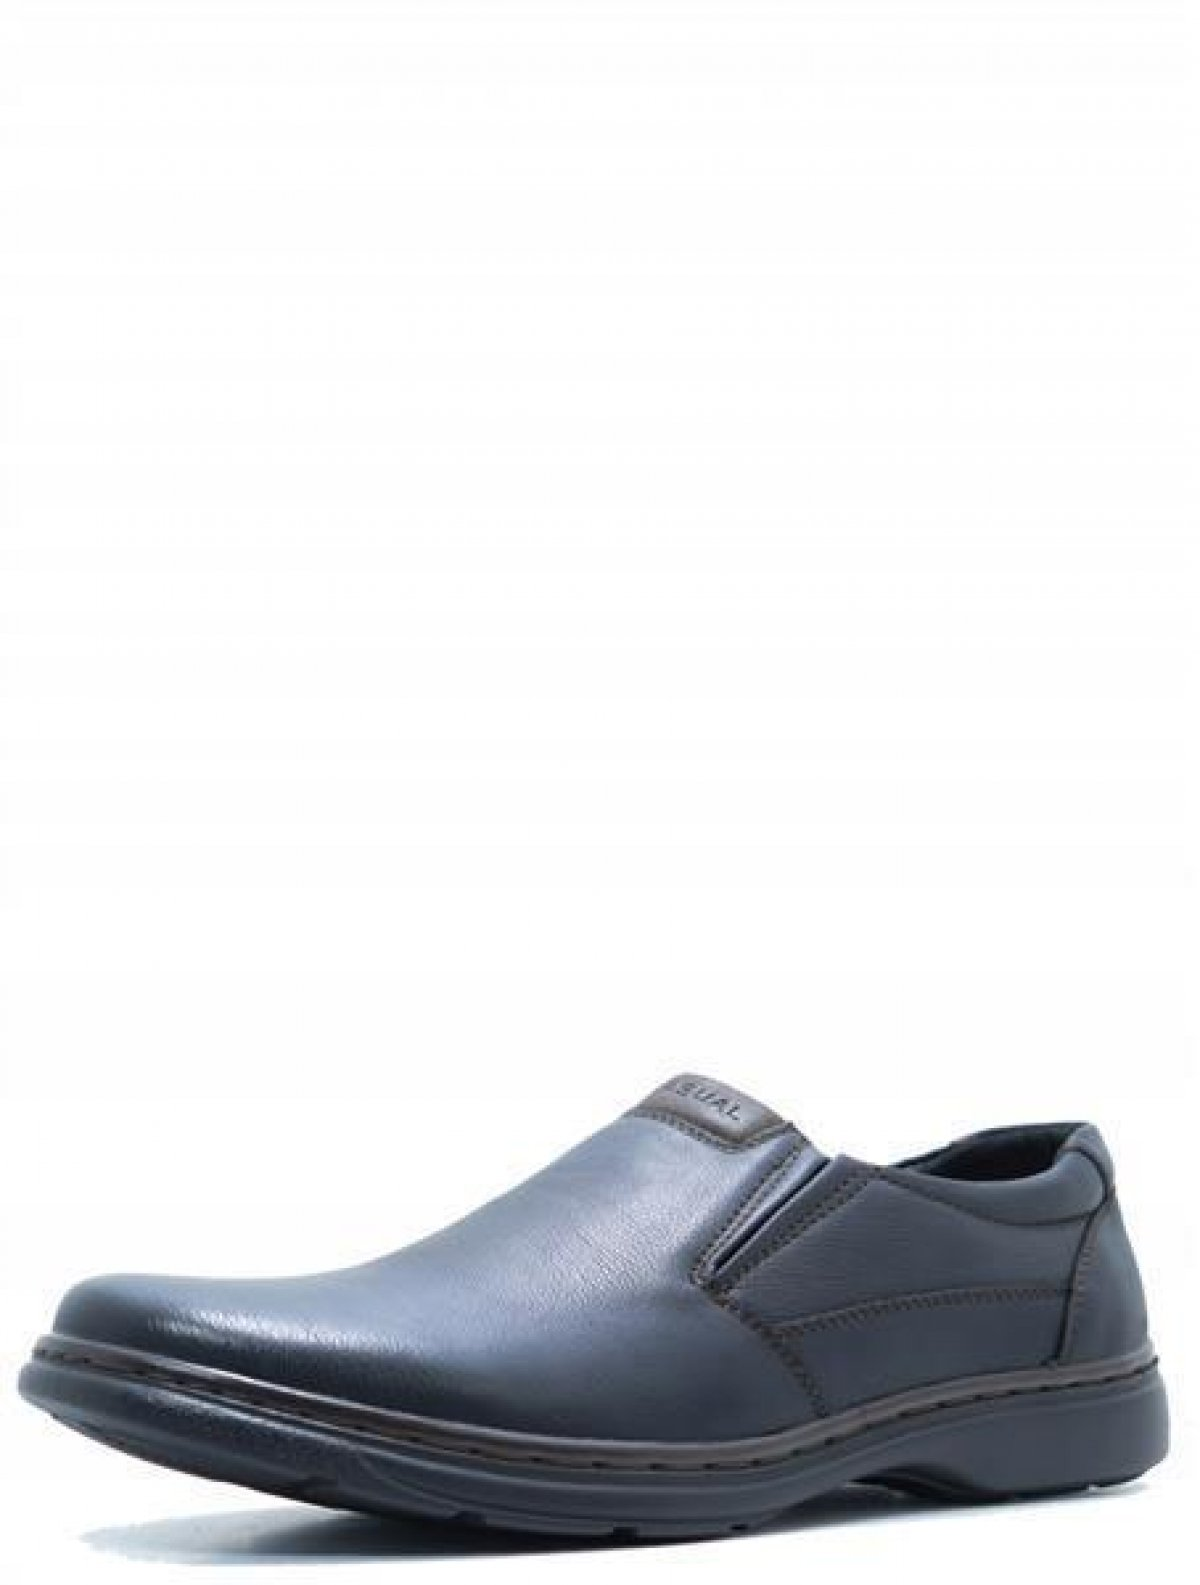 Carido S9981 мужские туфли